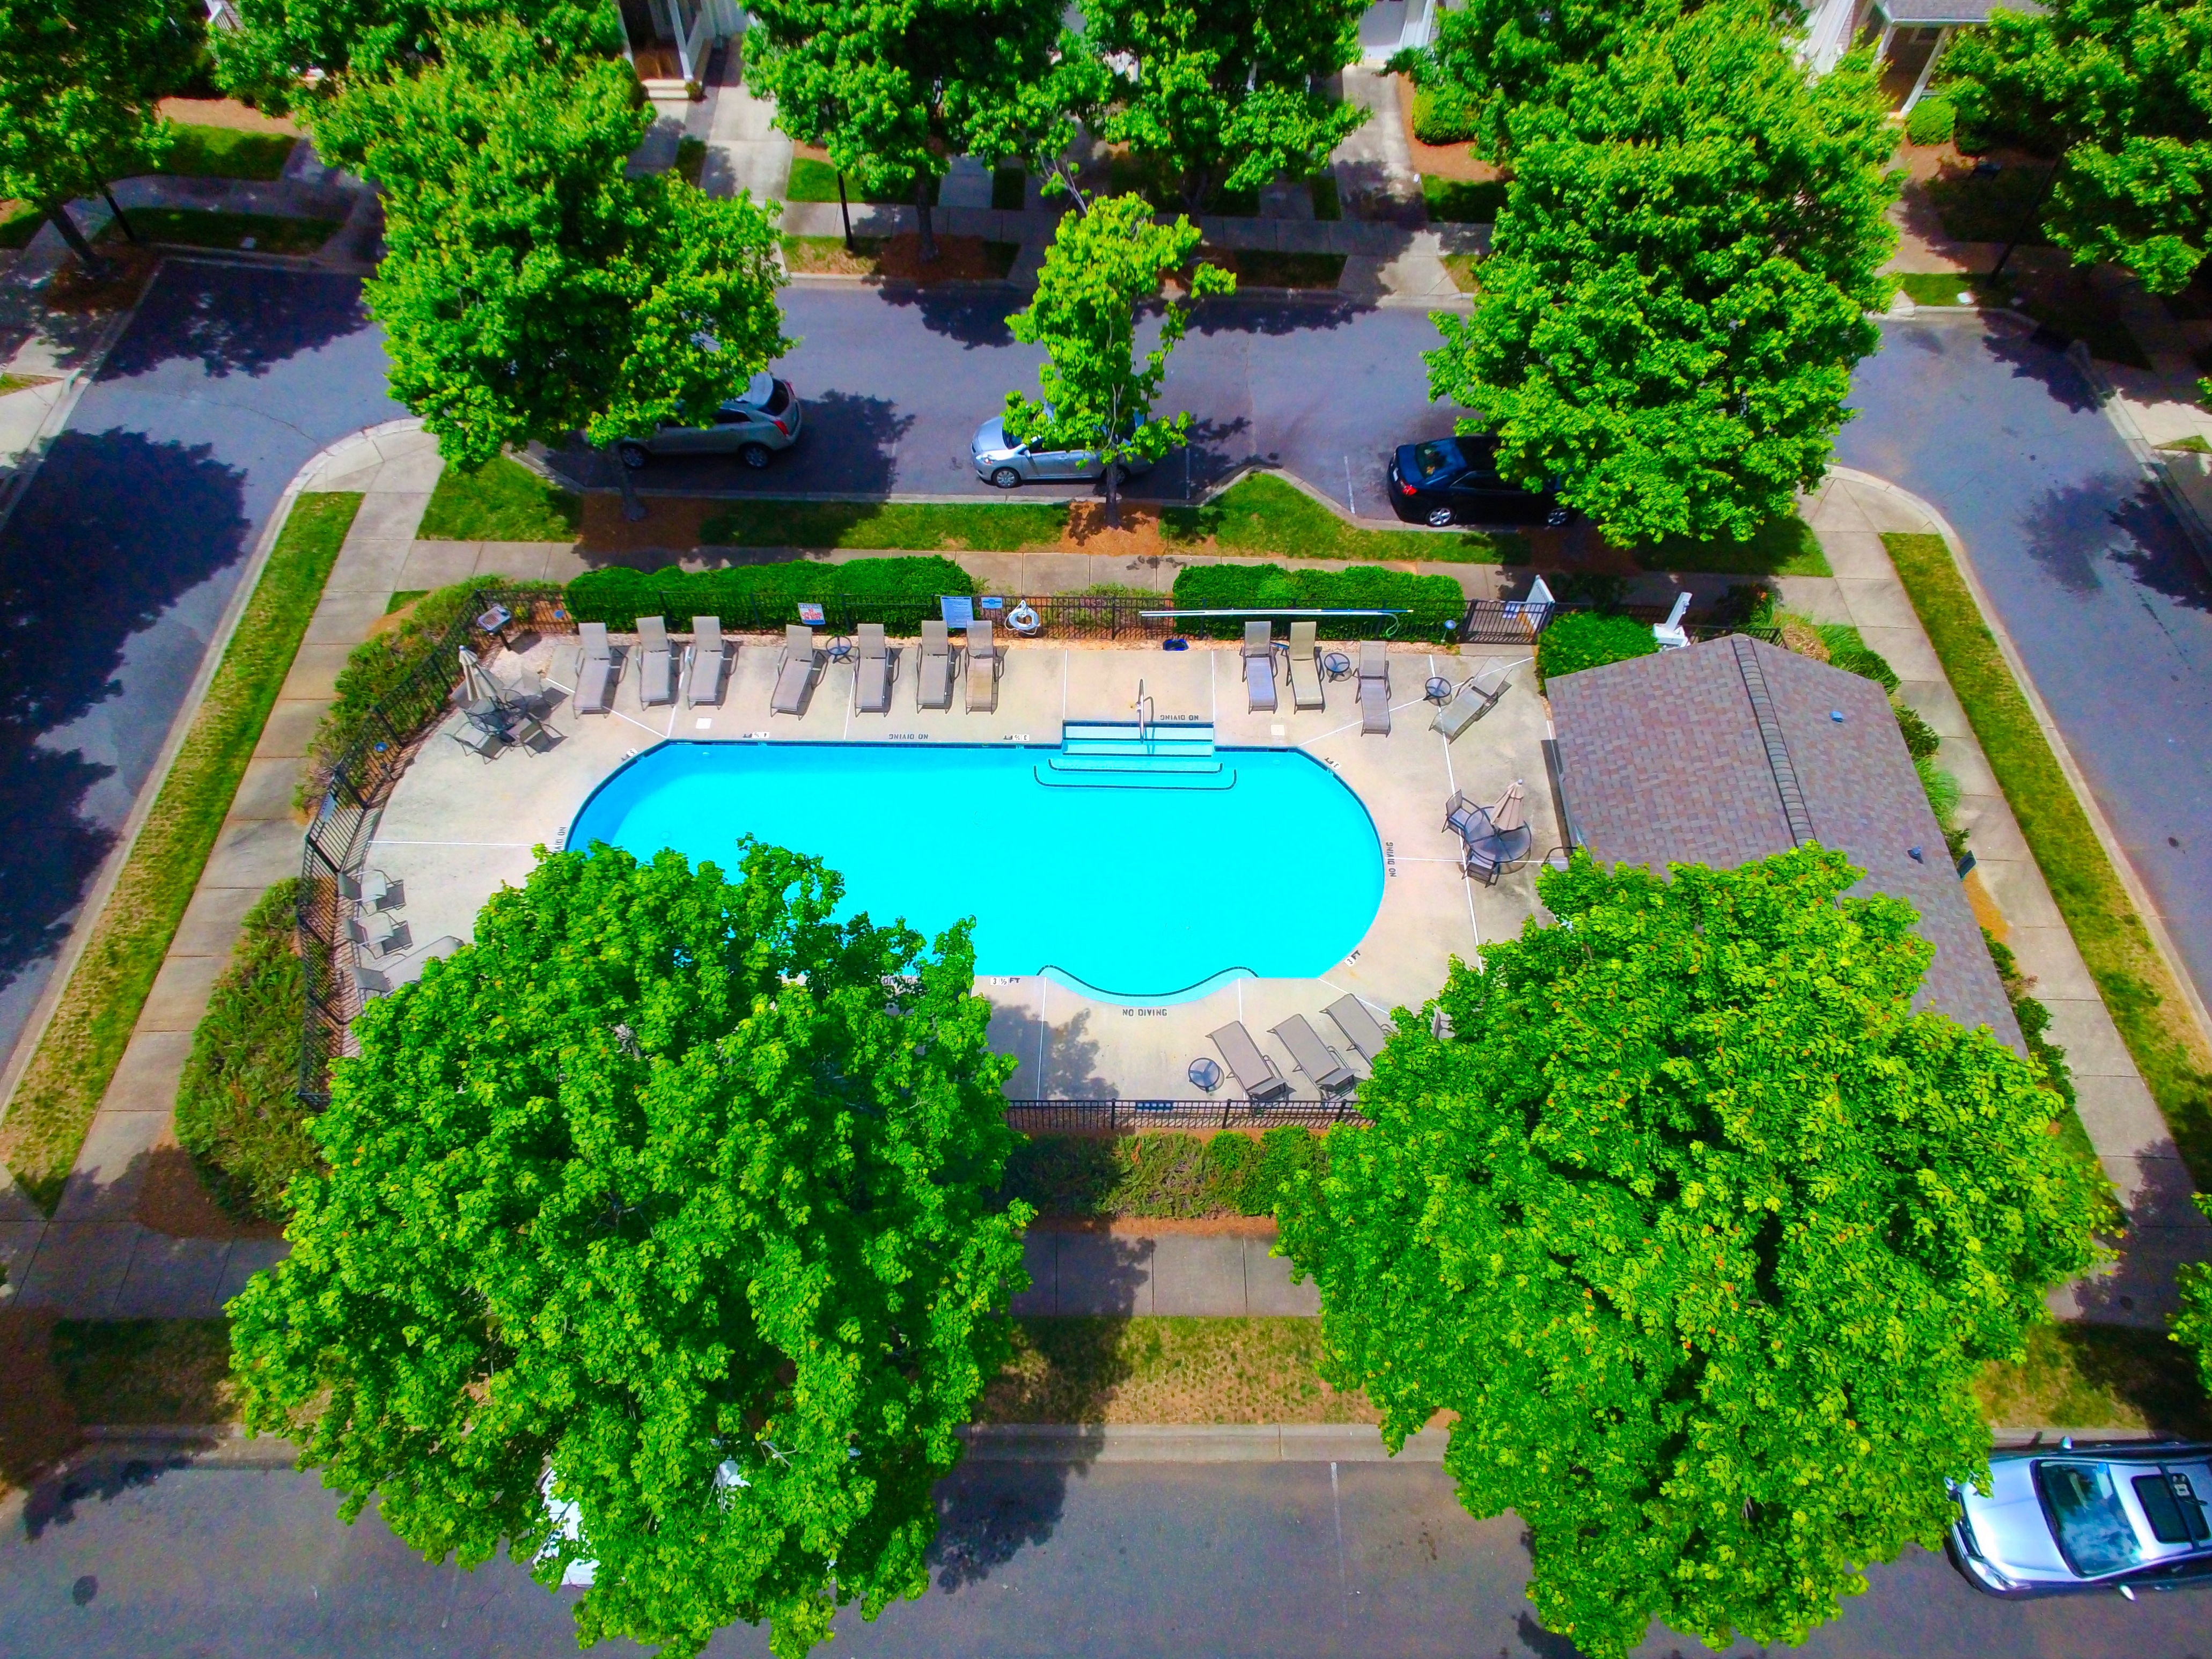 Harborside Pool